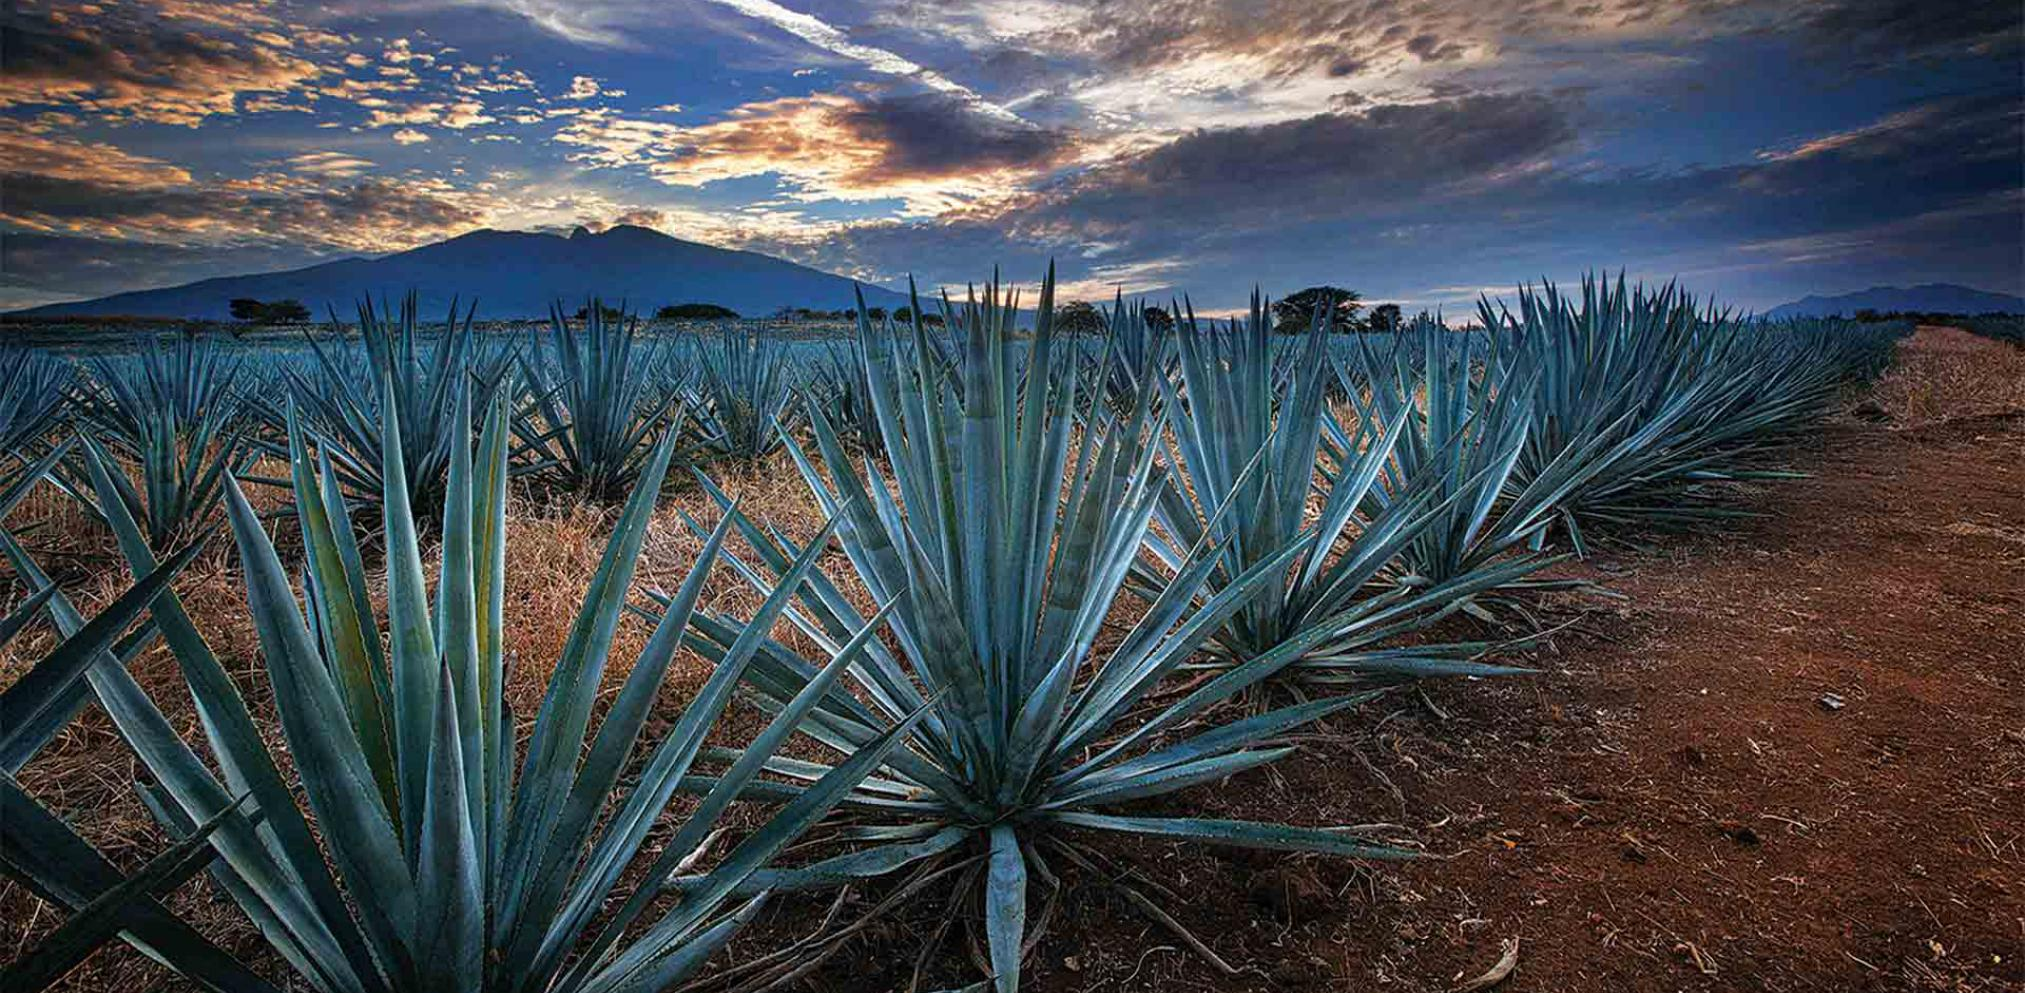 jalisco_destinos-principales_tequila_05_0.jpg